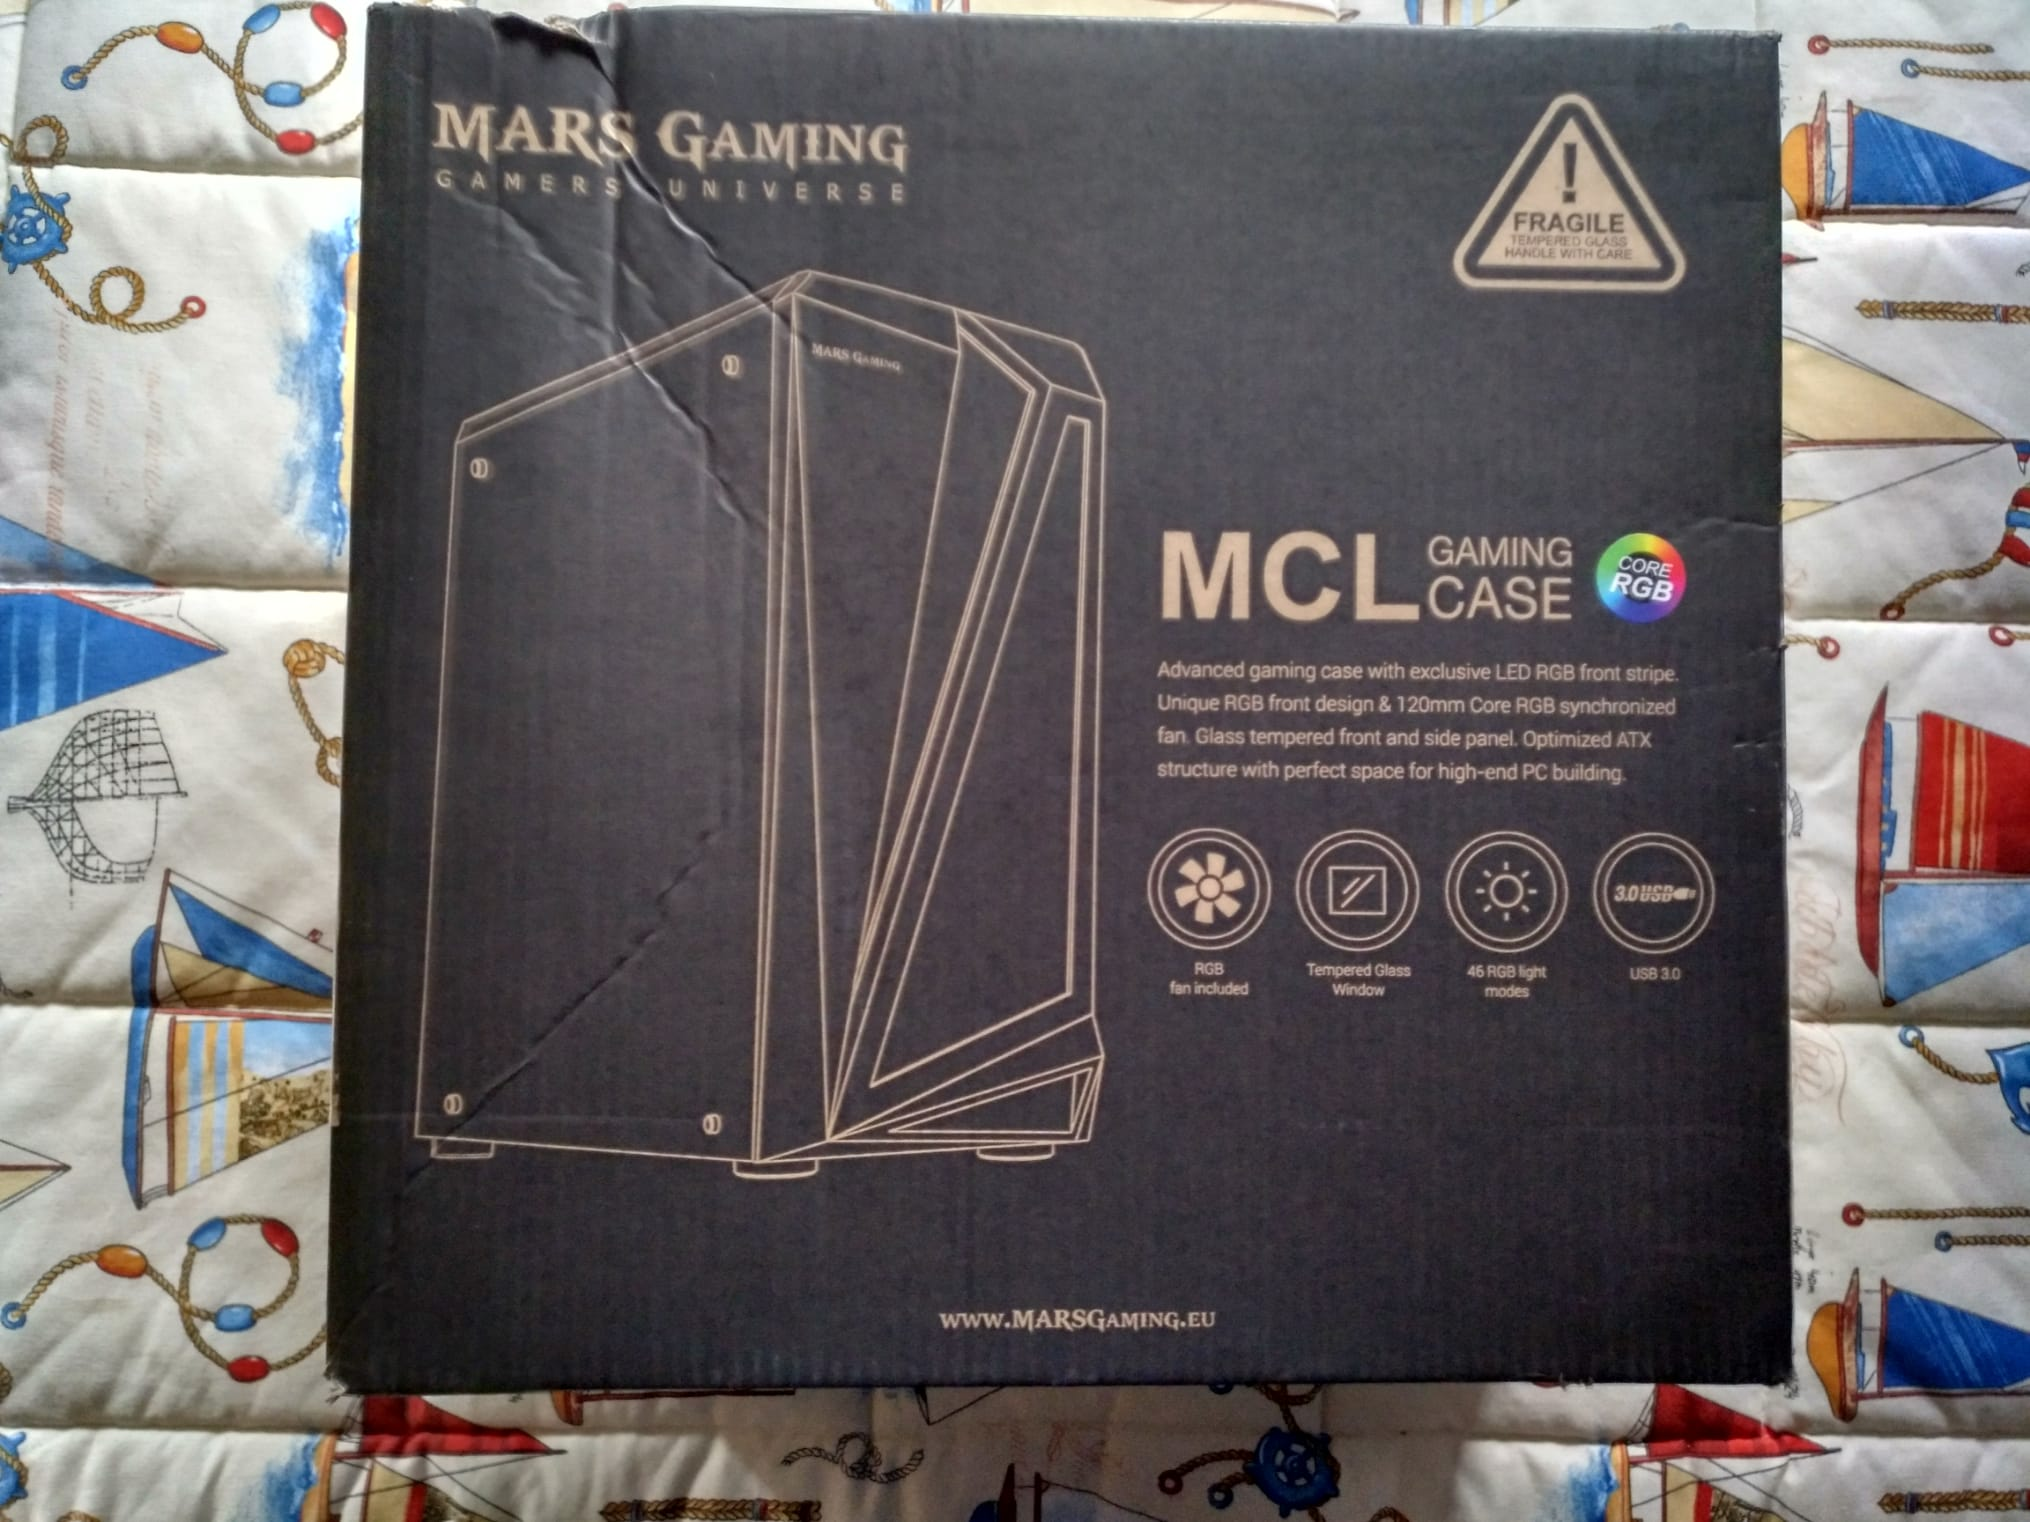 Semitorre Mars Gaming MCL Review en Español